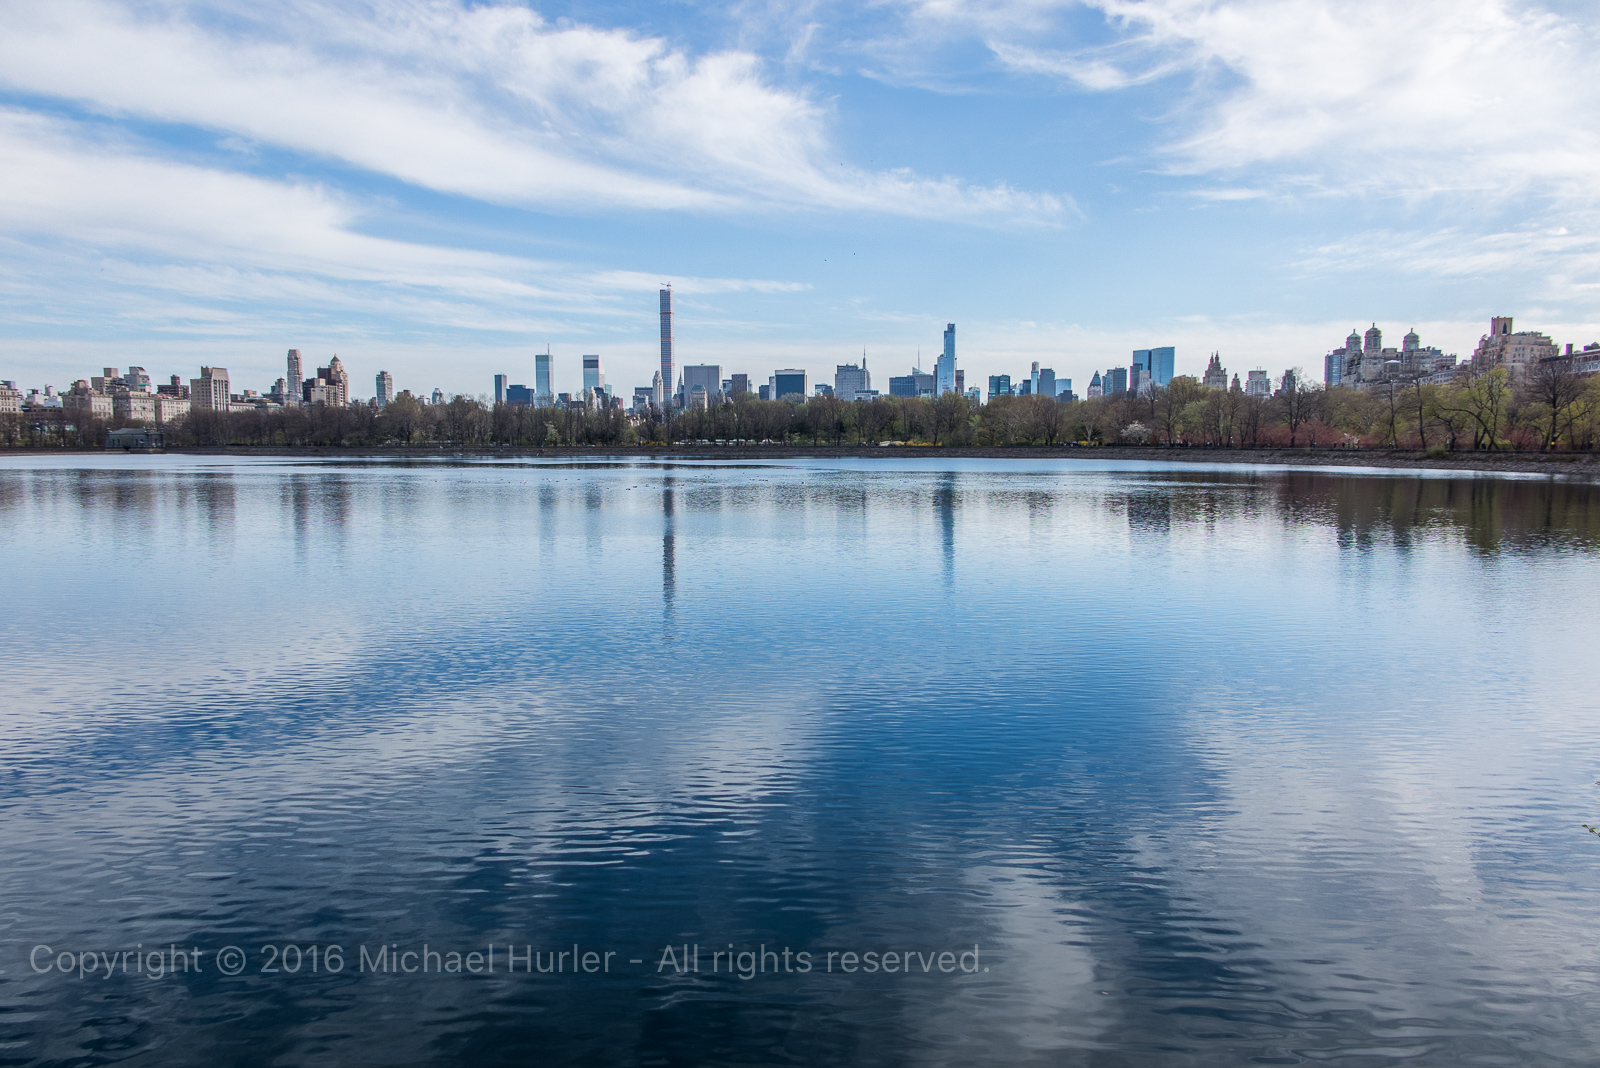 25.04.2015, New York